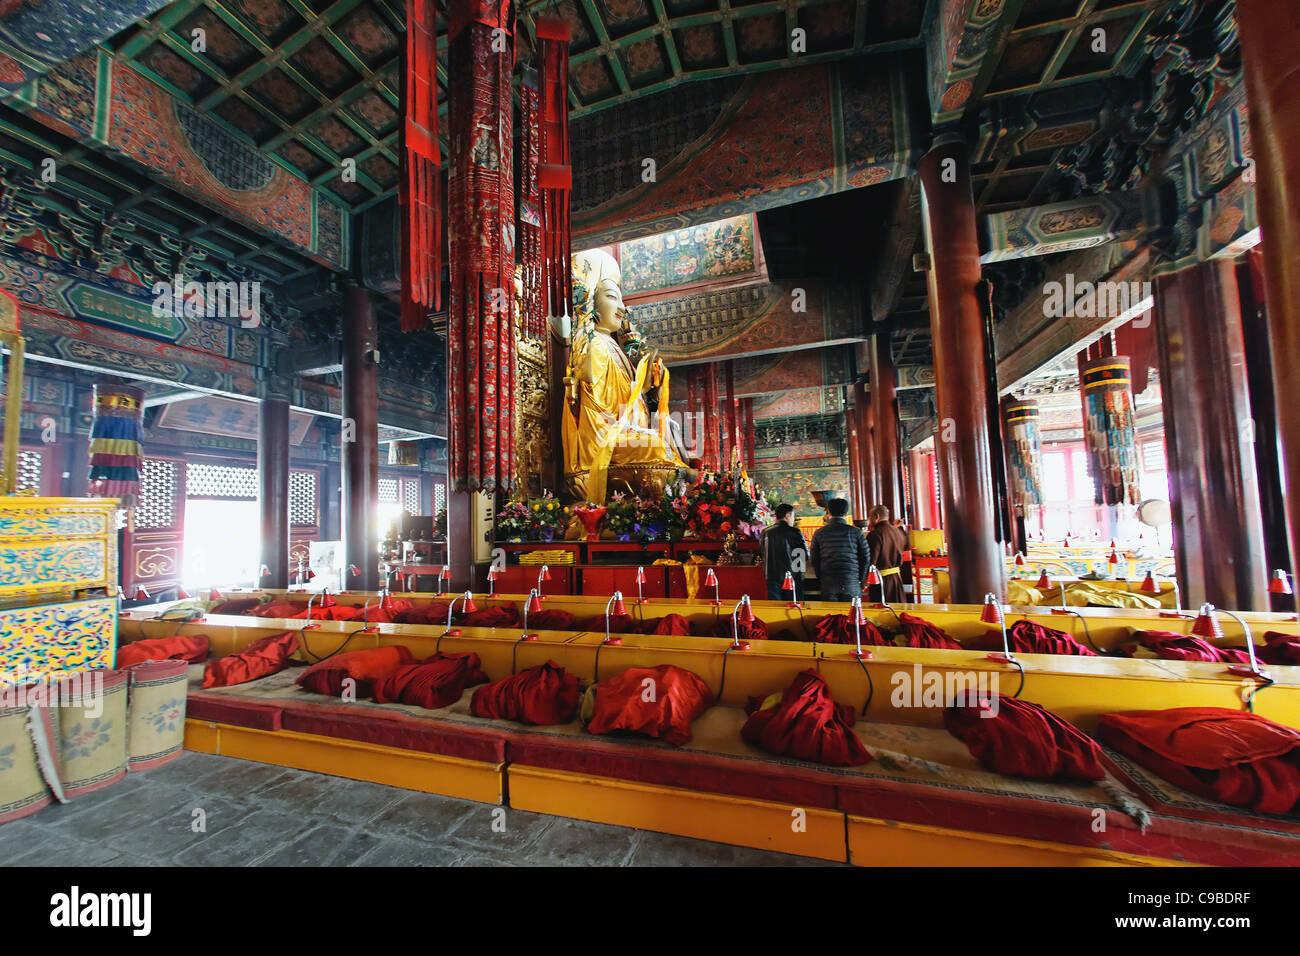 Orando en la zona budista YongHeGong Templo Lama, Beijing, China Foto de stock